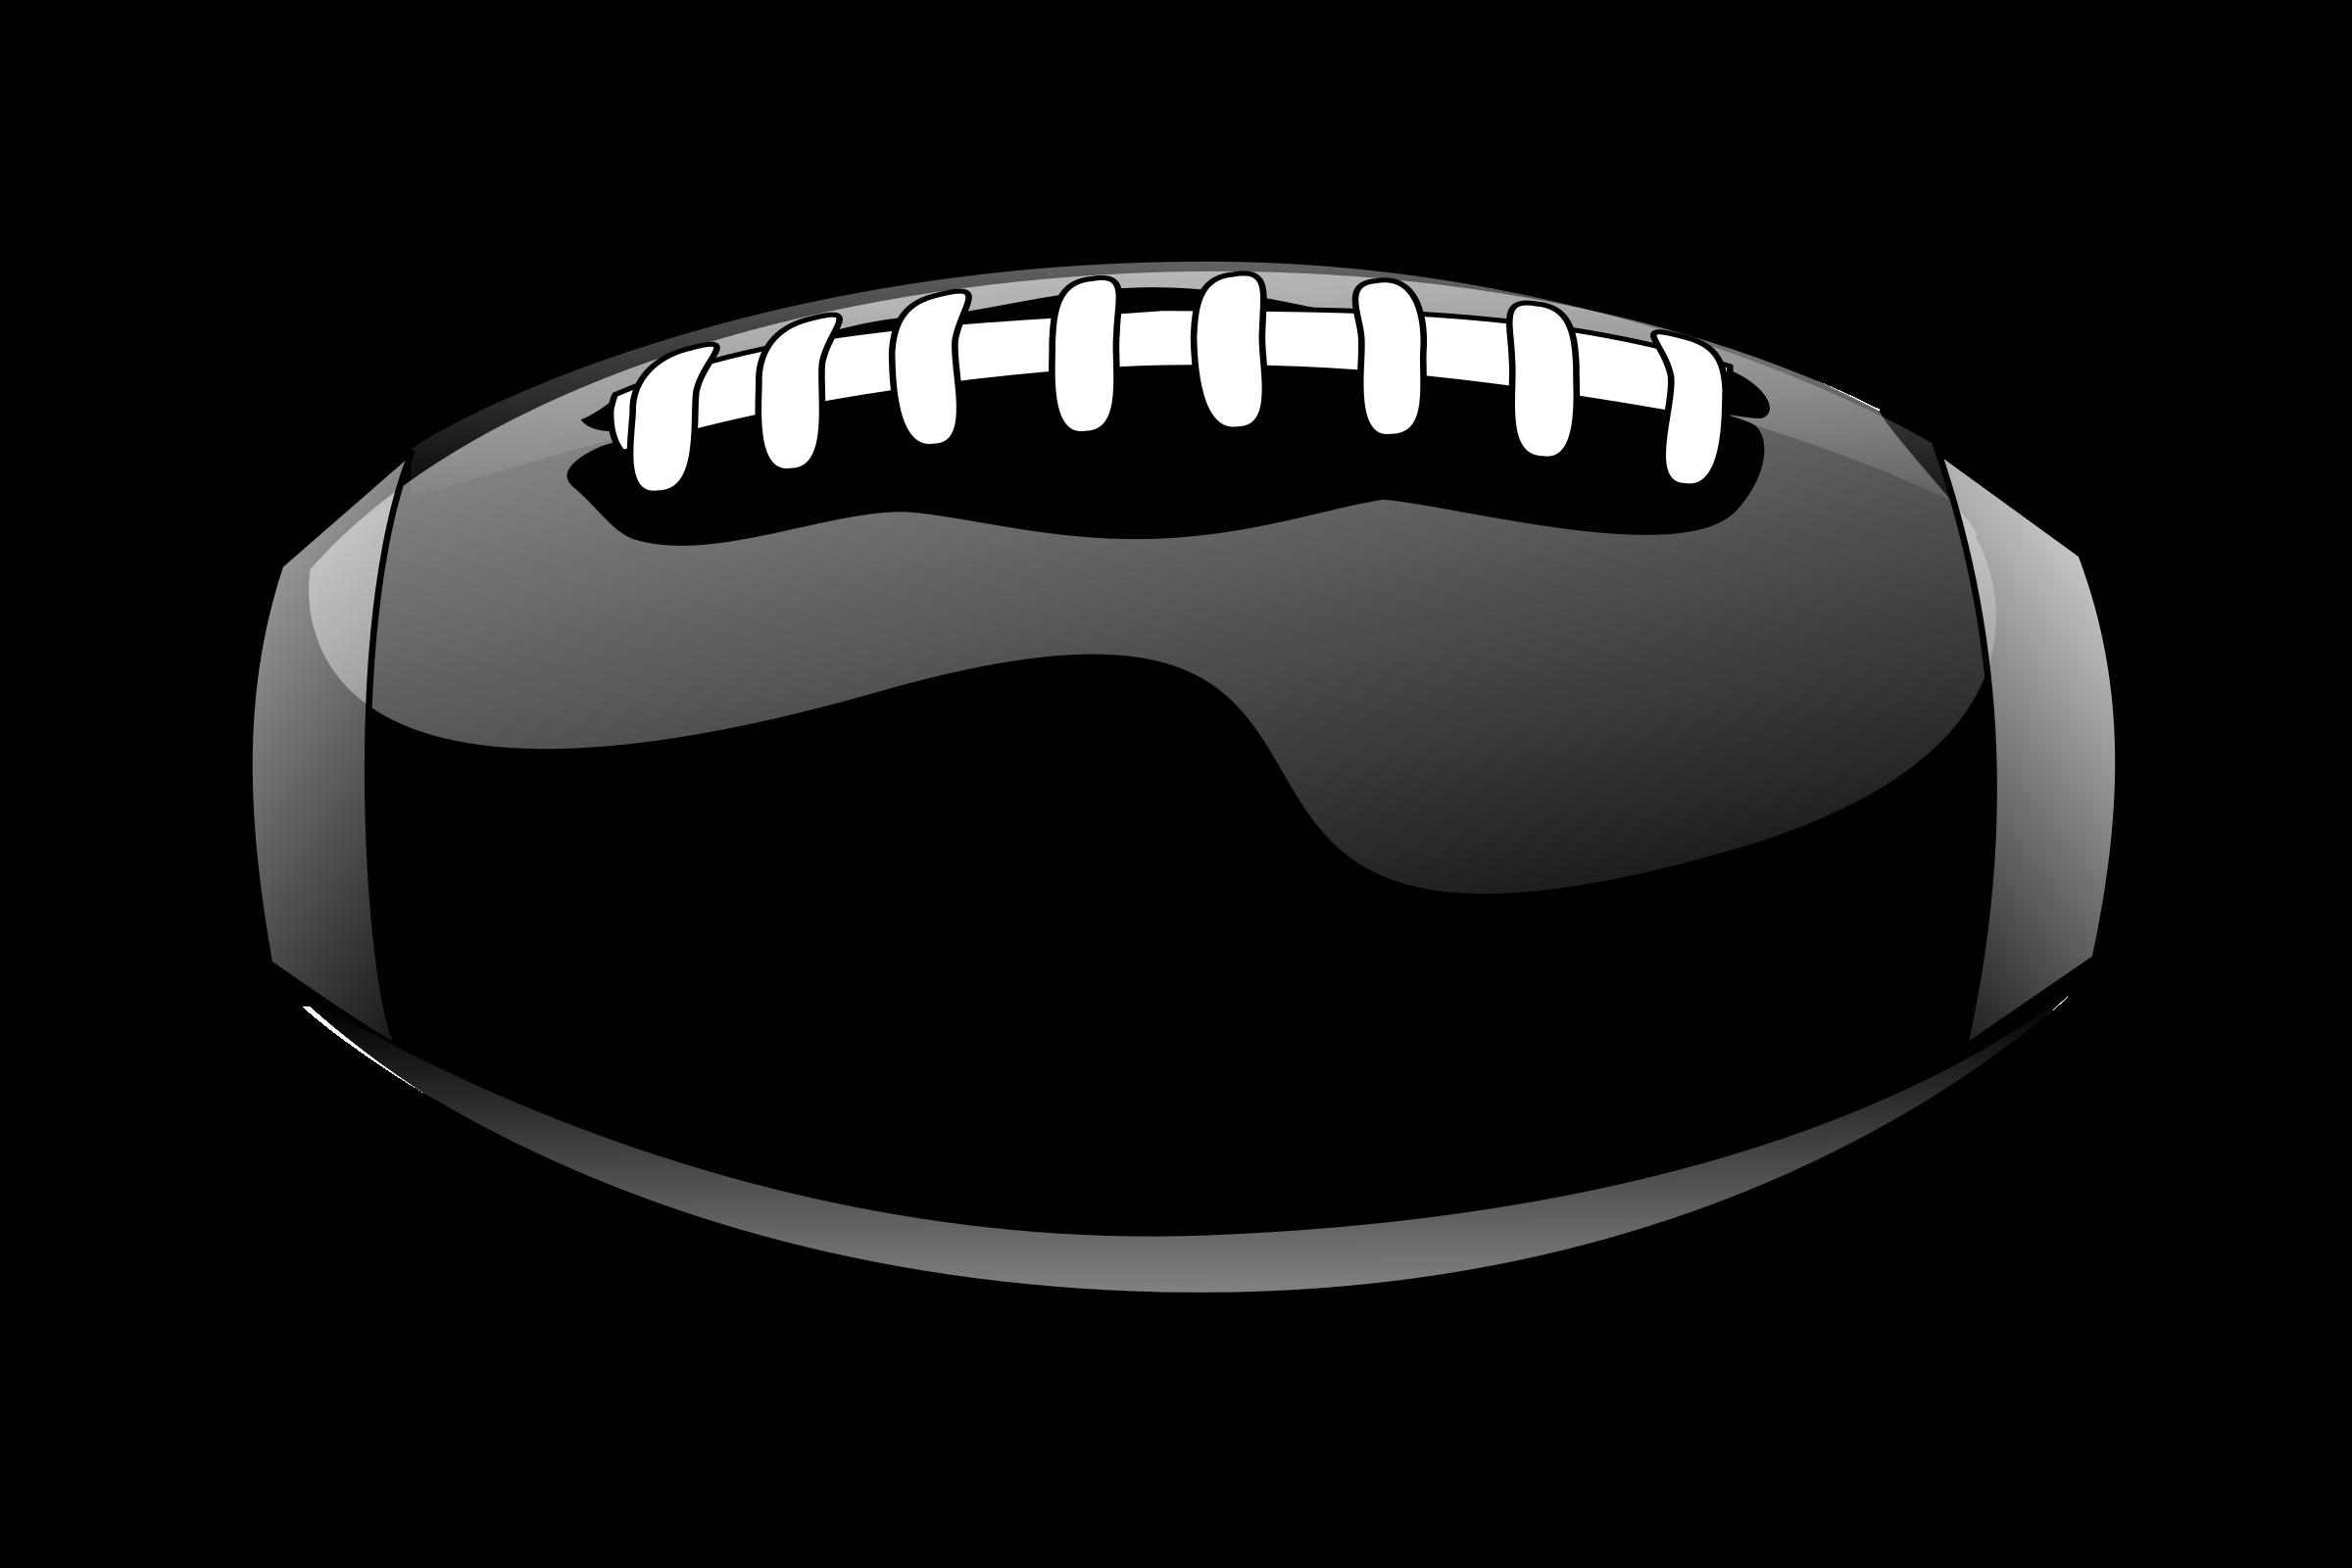 american football ball png image purepng free transparent cc0